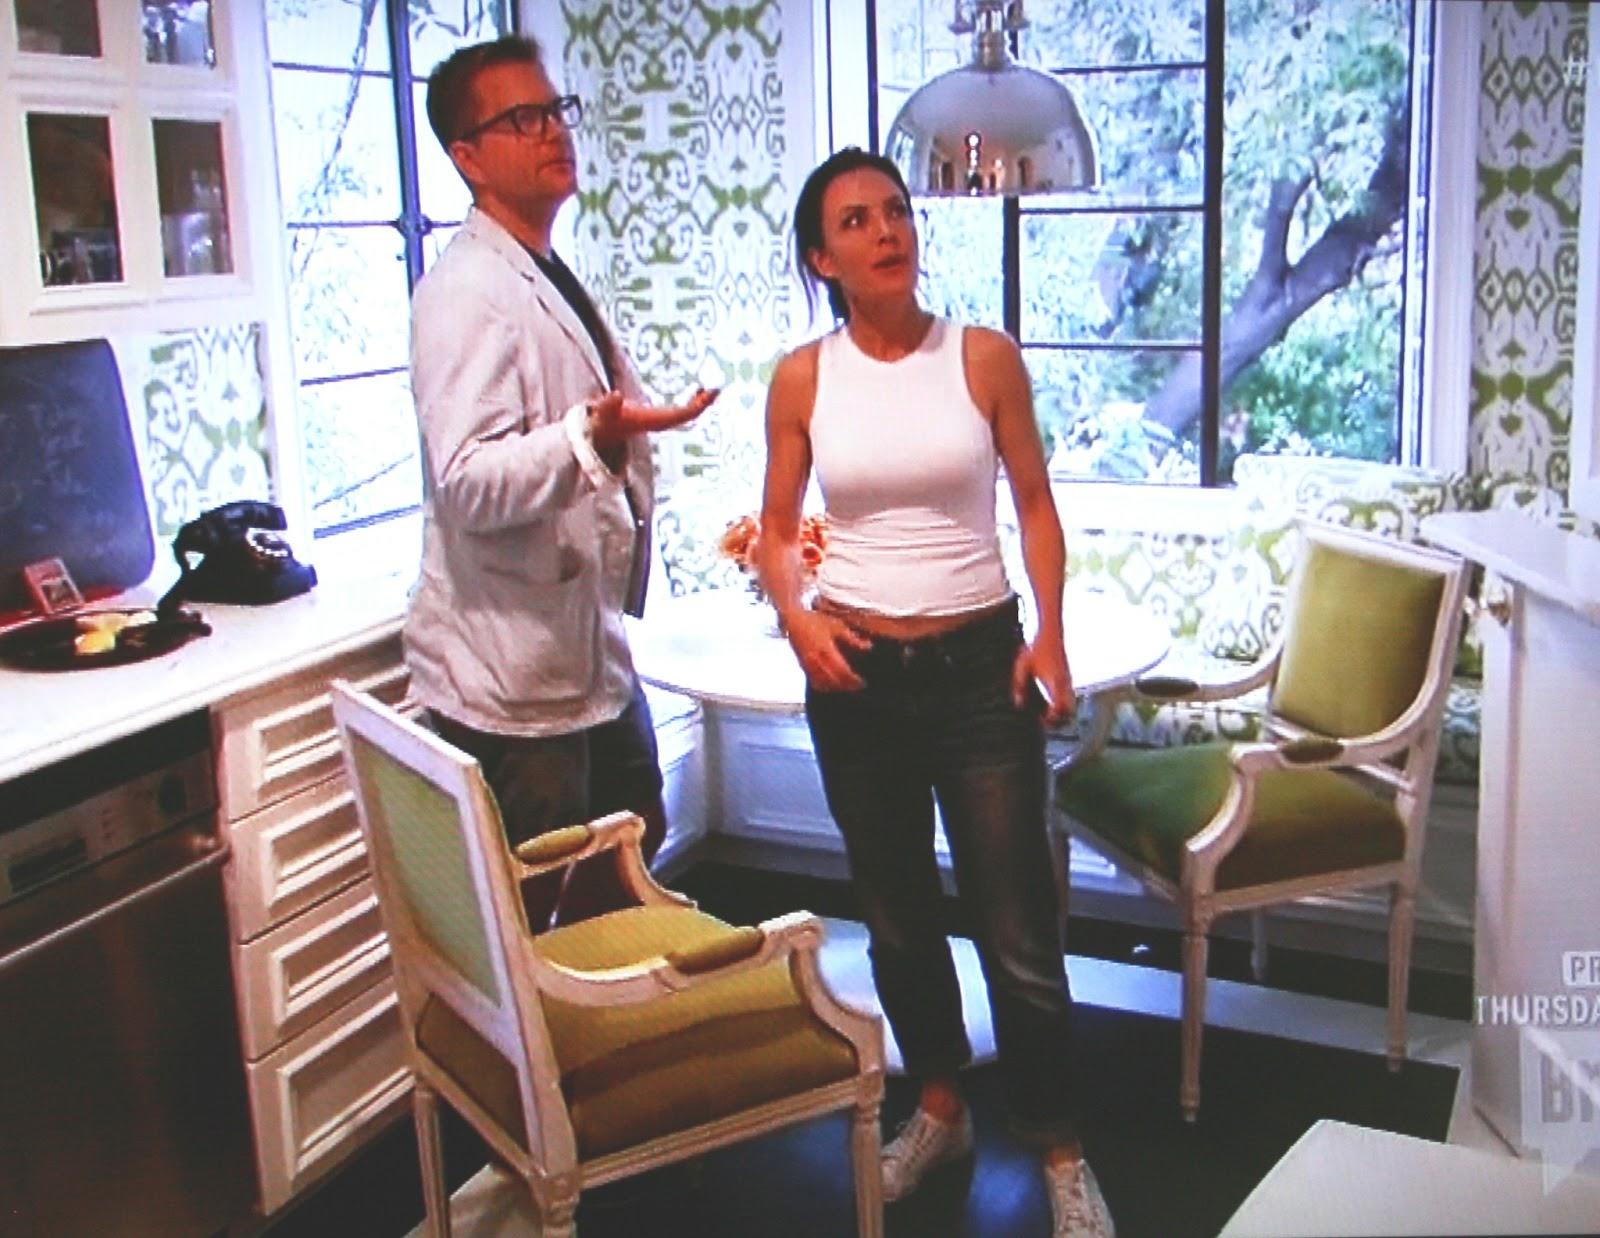 Million Dollar Decorators Ciao Newport Beach Mary Mcdonald's Home On M D D